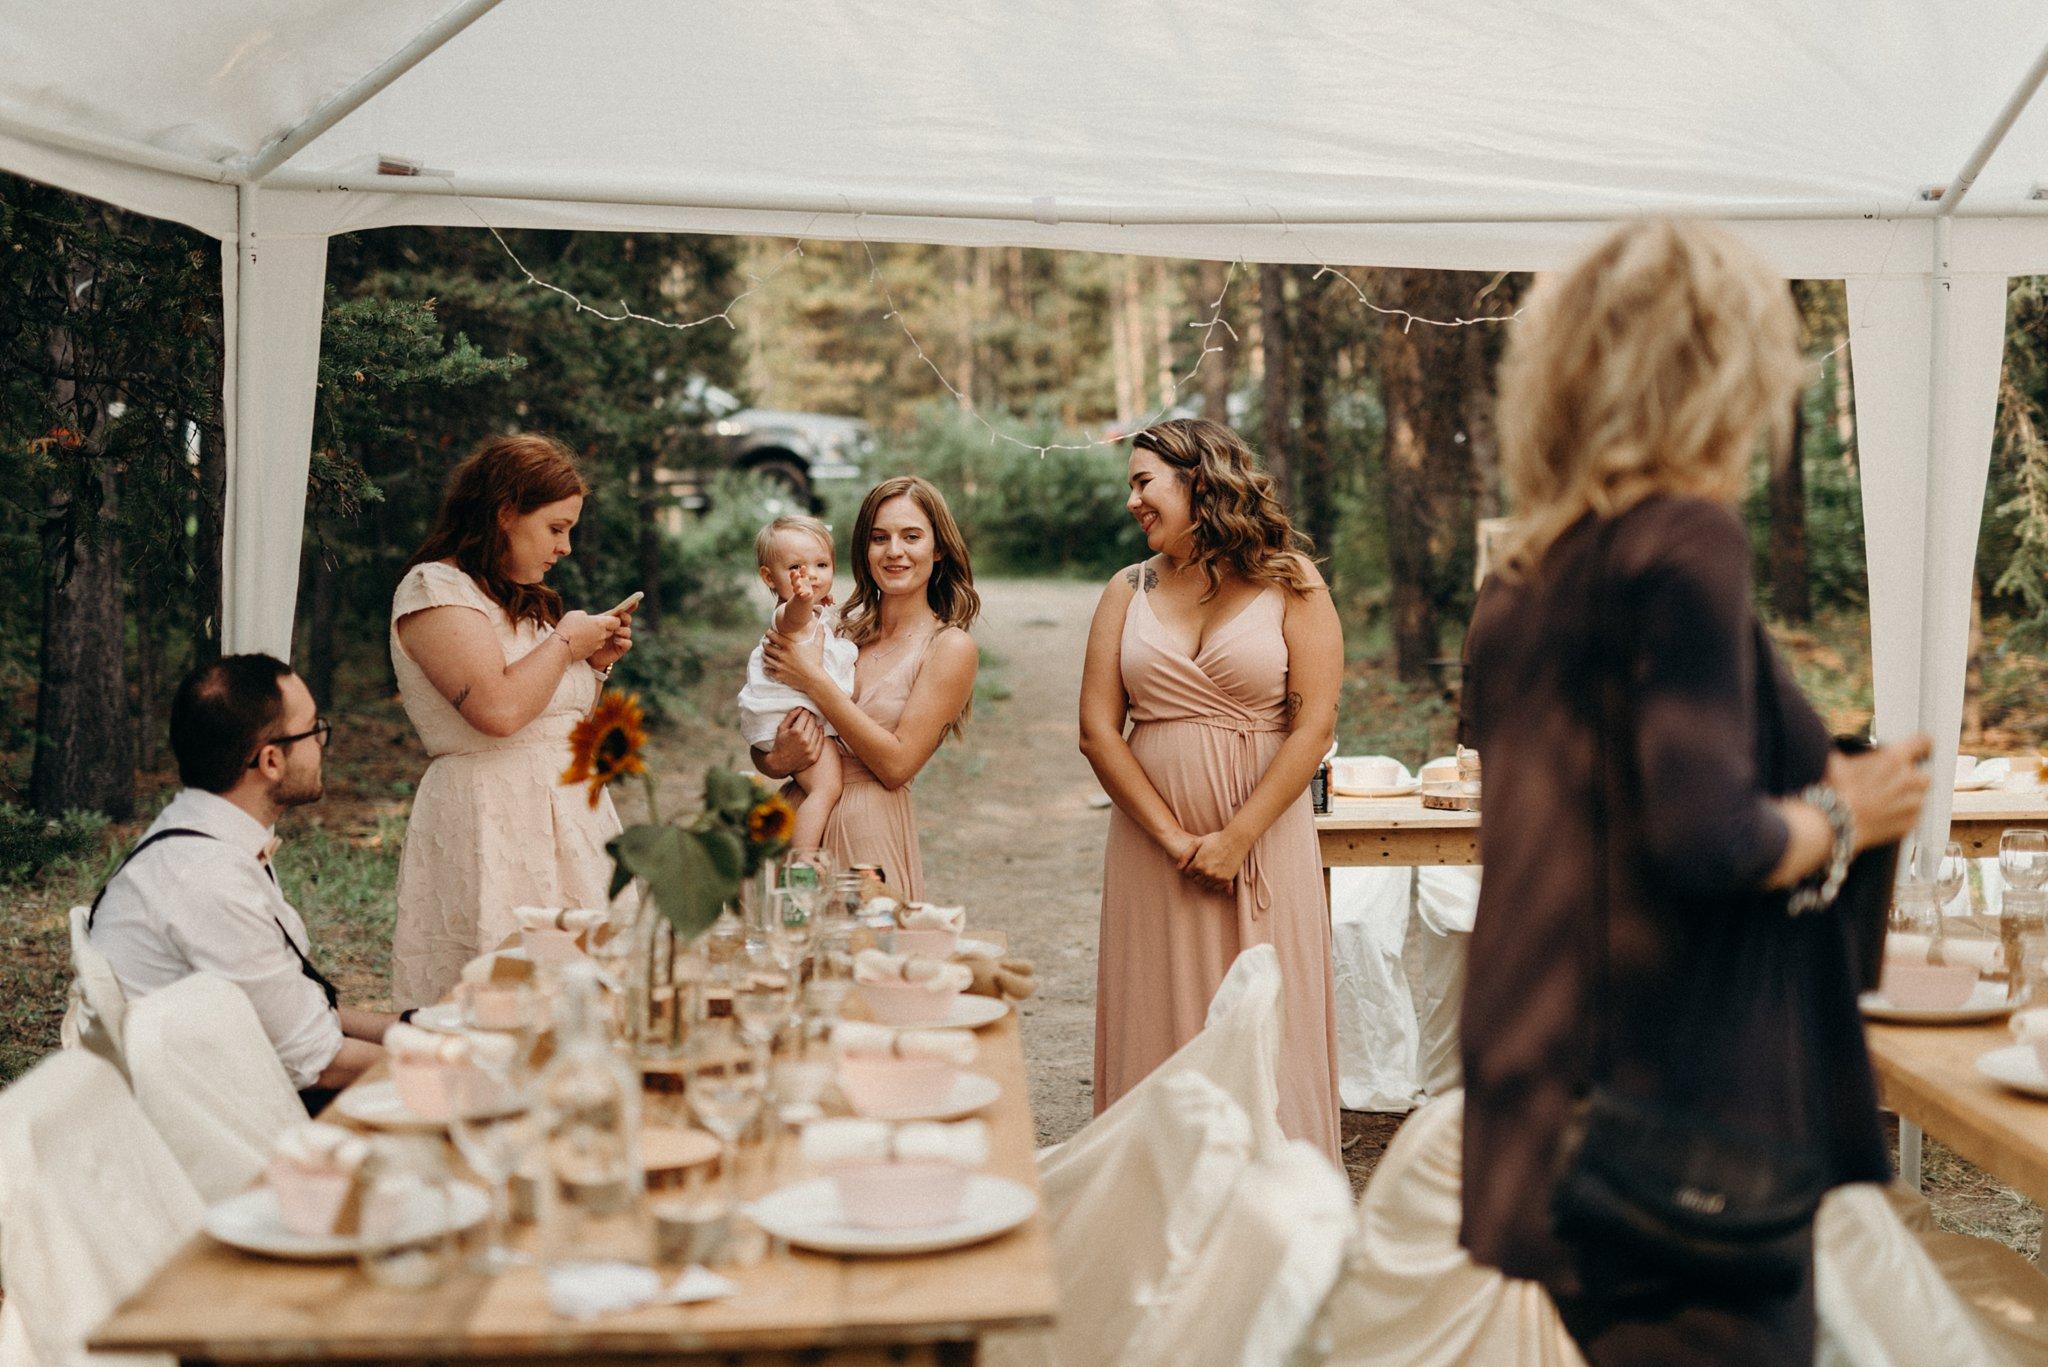 kaihla_tonai_intimate_wedding_elopement_photographer_6415.jpg